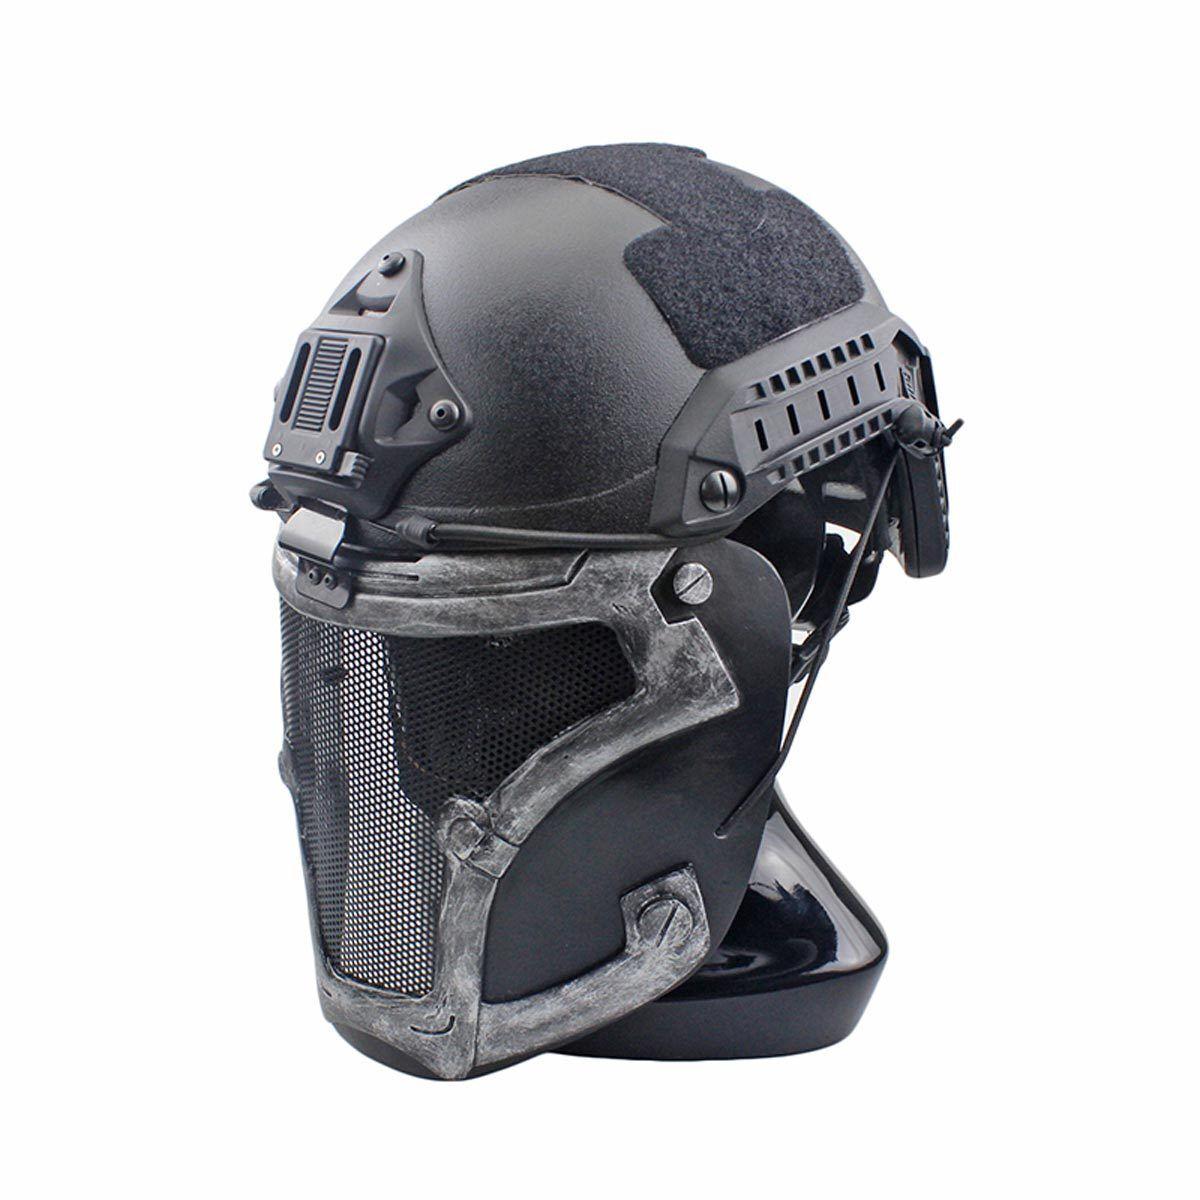 NEW Wire Mesh Glass Fiber Resin Airsoft CS Half Face Mask For Helmet M133